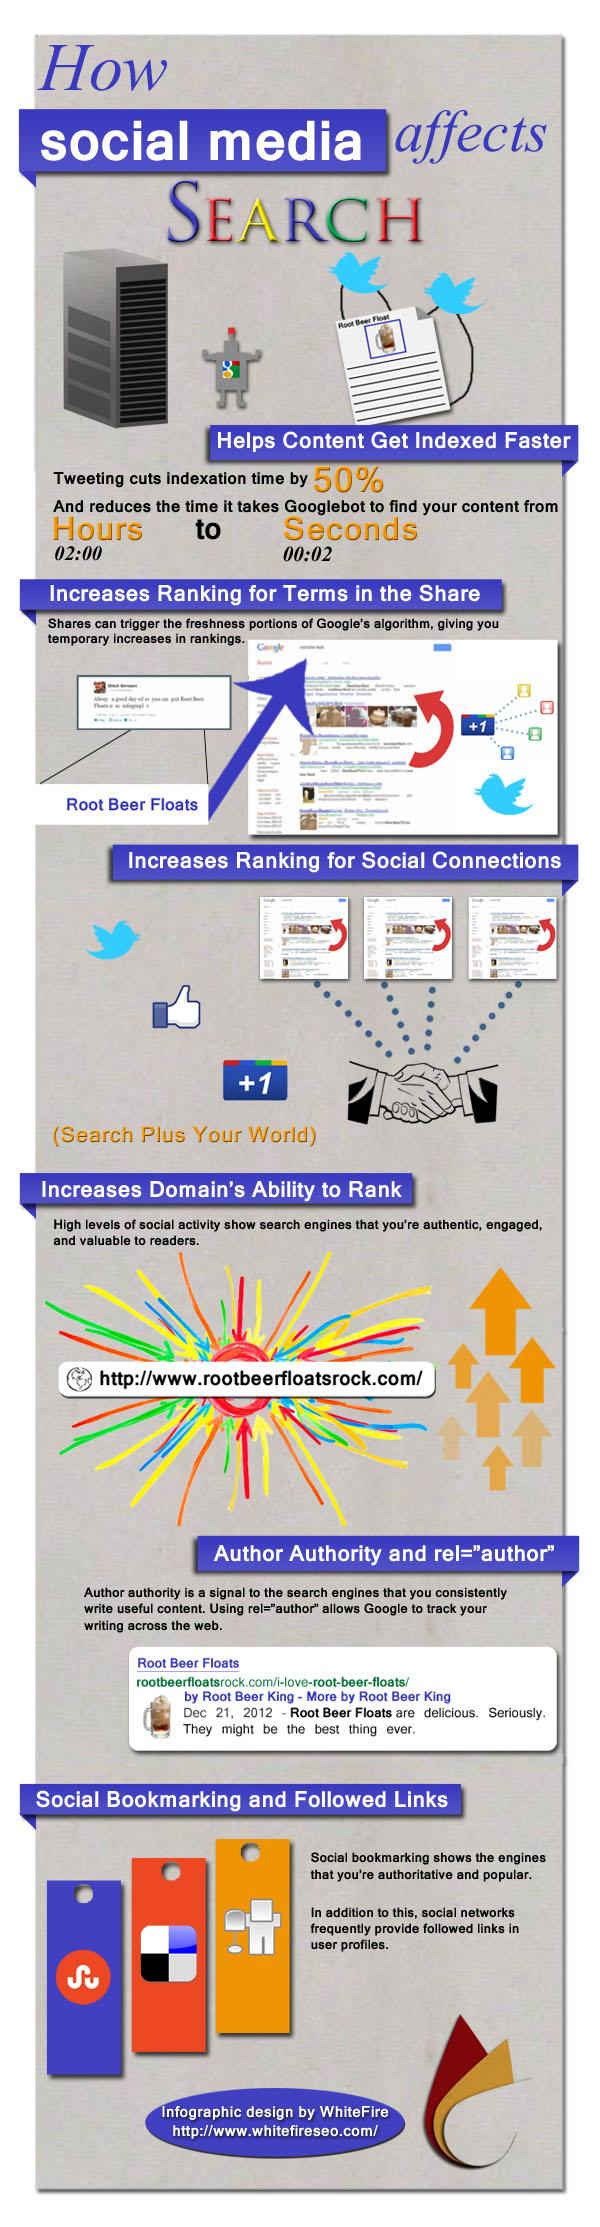 social media afecta a las búsquedas